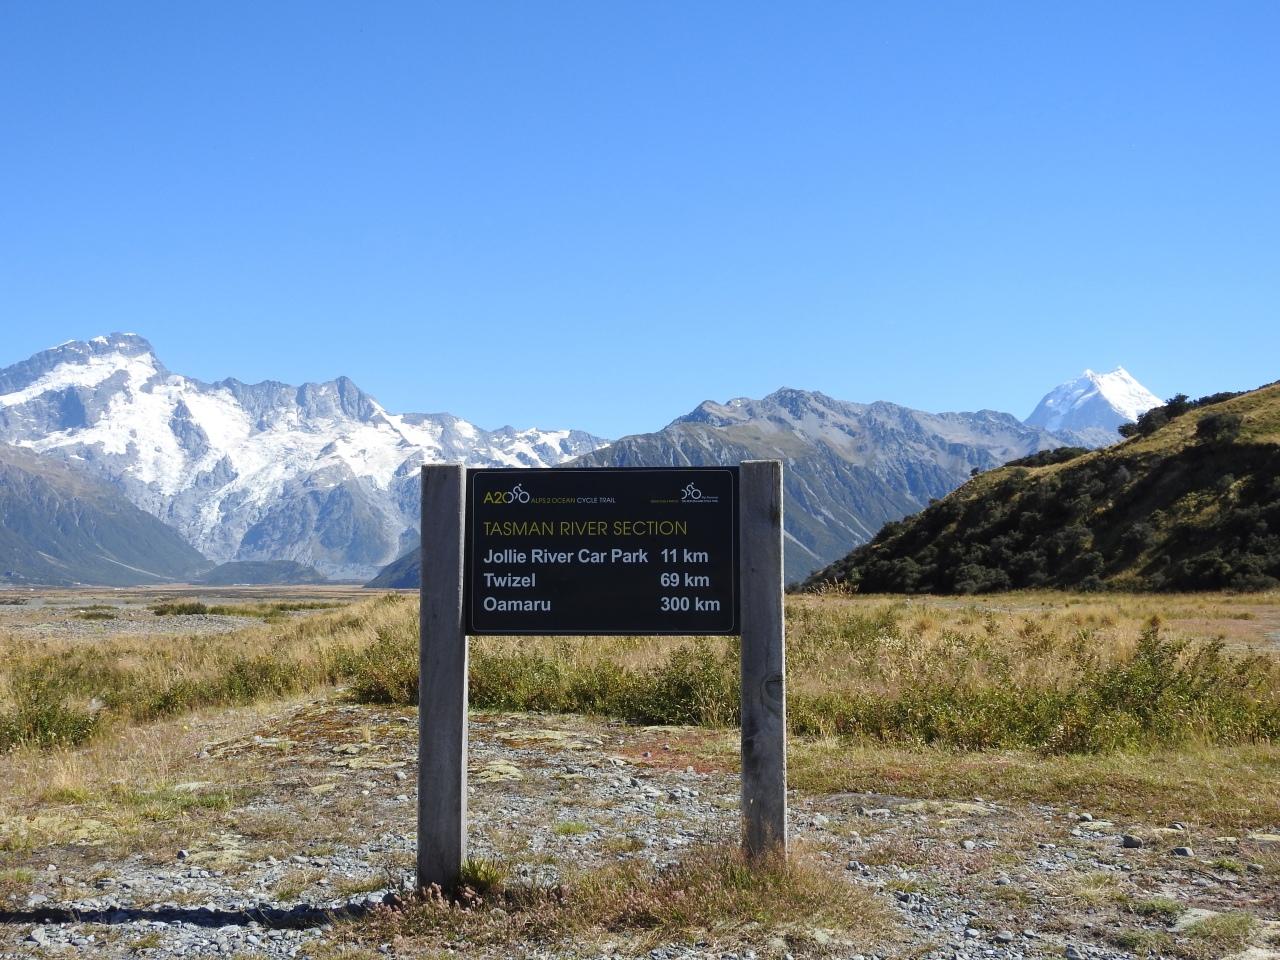 Alps 2 Ocean Cycle Trail NewZealand